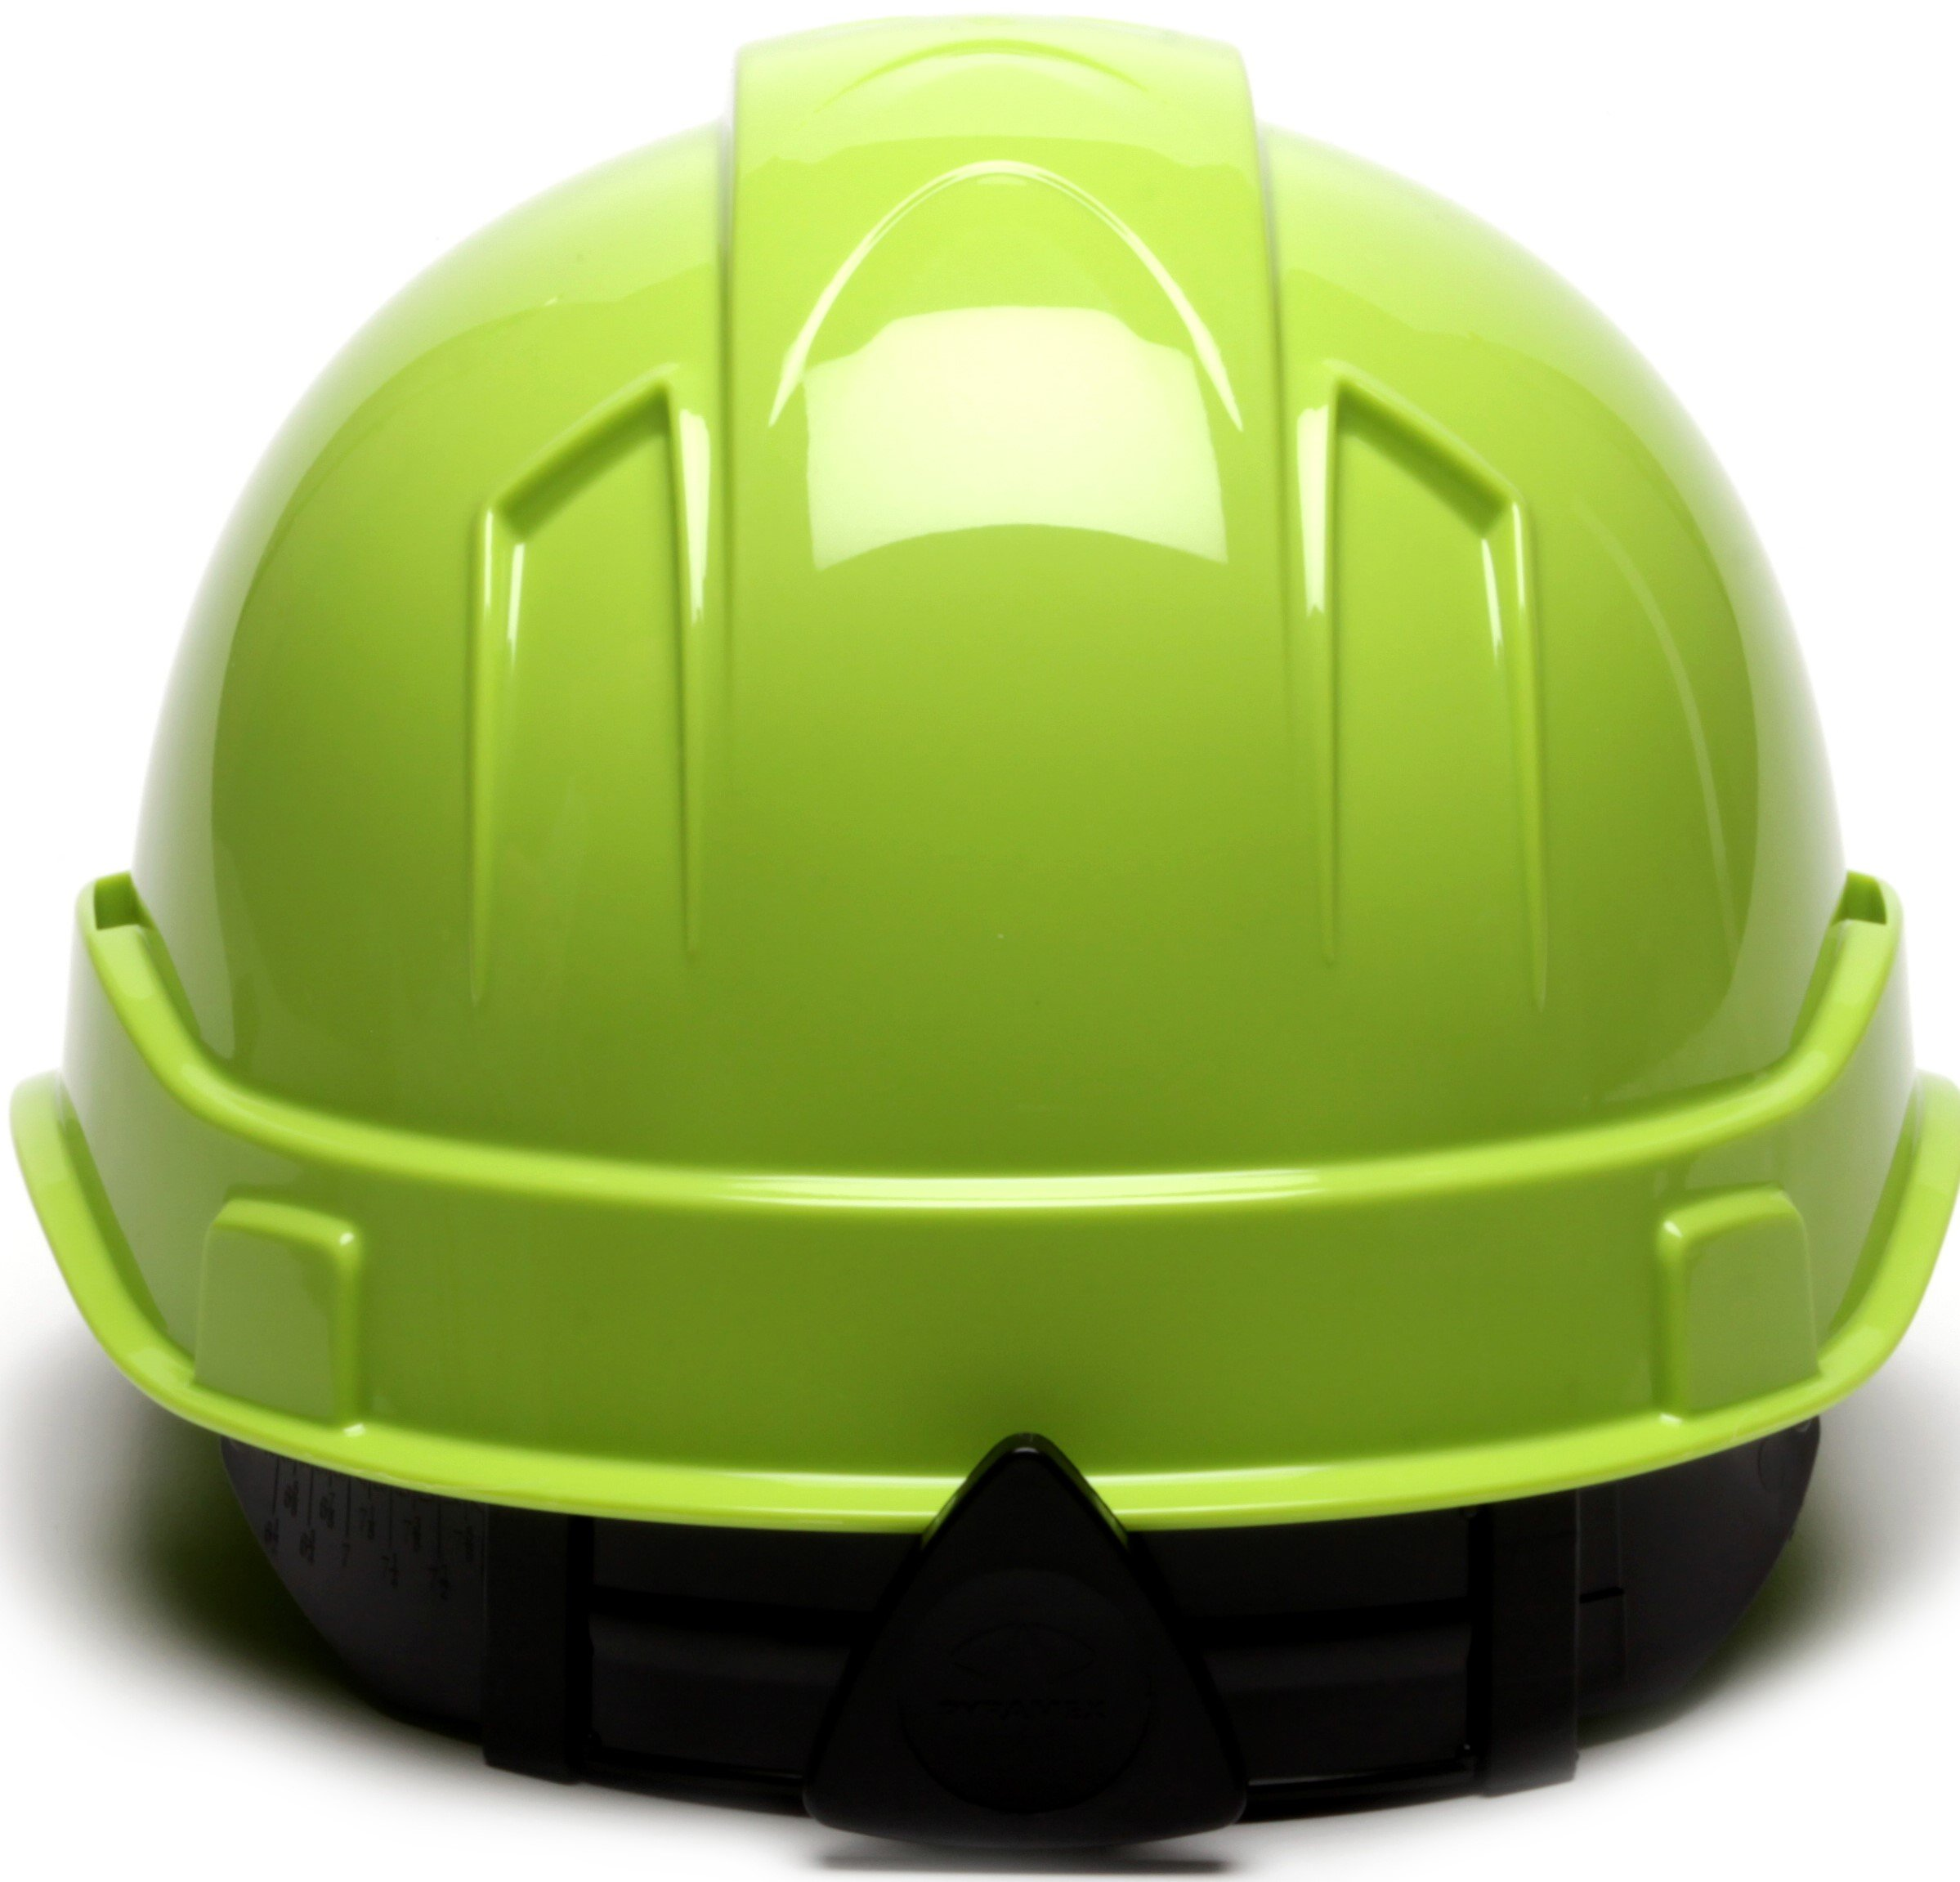 Pyramex Ridgeline Cap Style Hard Hat, 6 Point Ratchet Suspension, Hi Vis Lime by Pyramex Safety (Image #4)